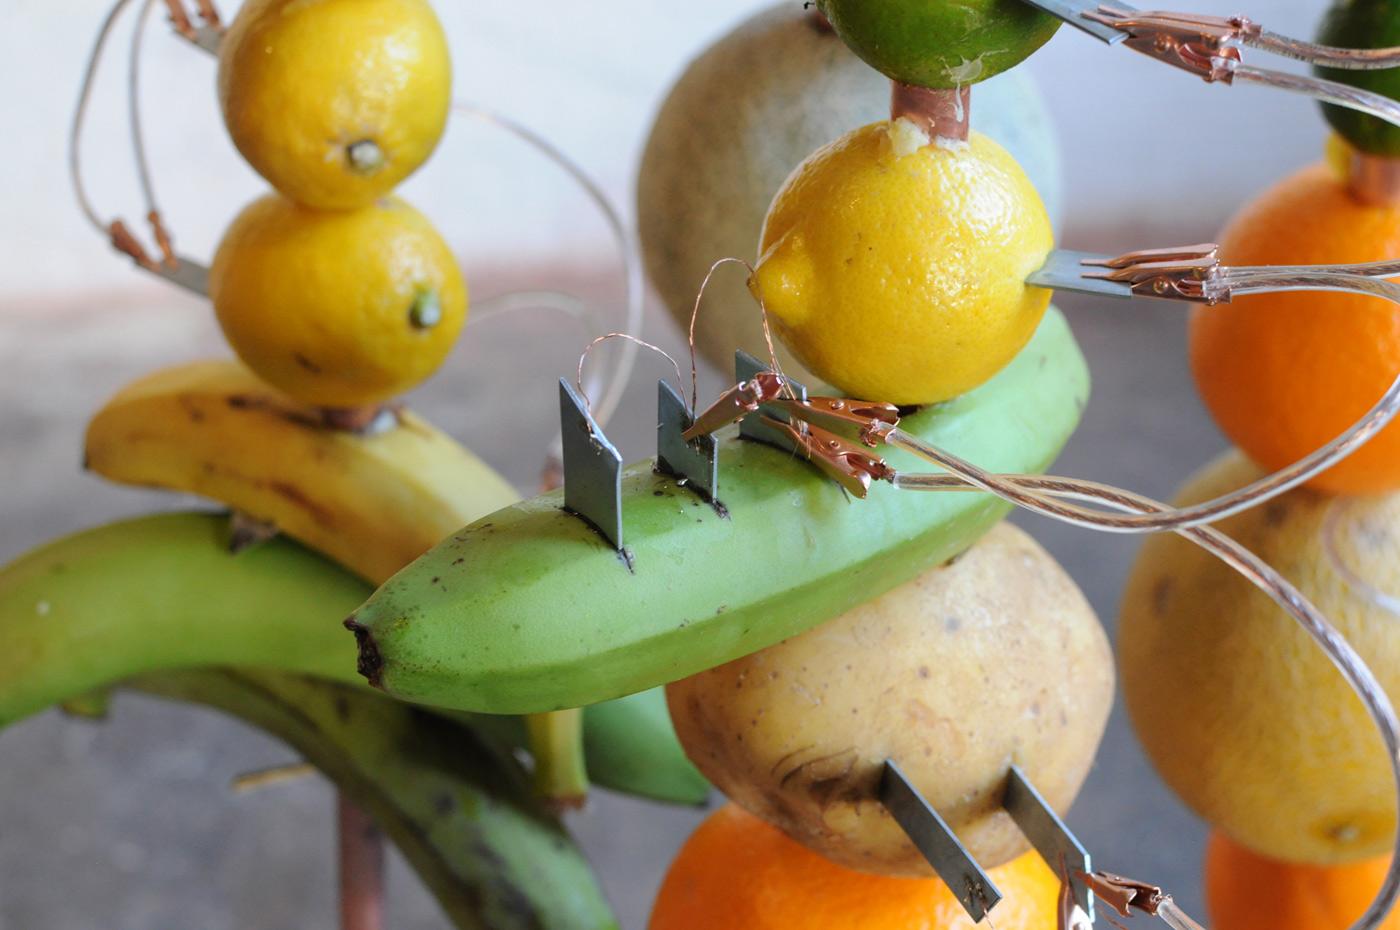 make lemon battery investigatory project